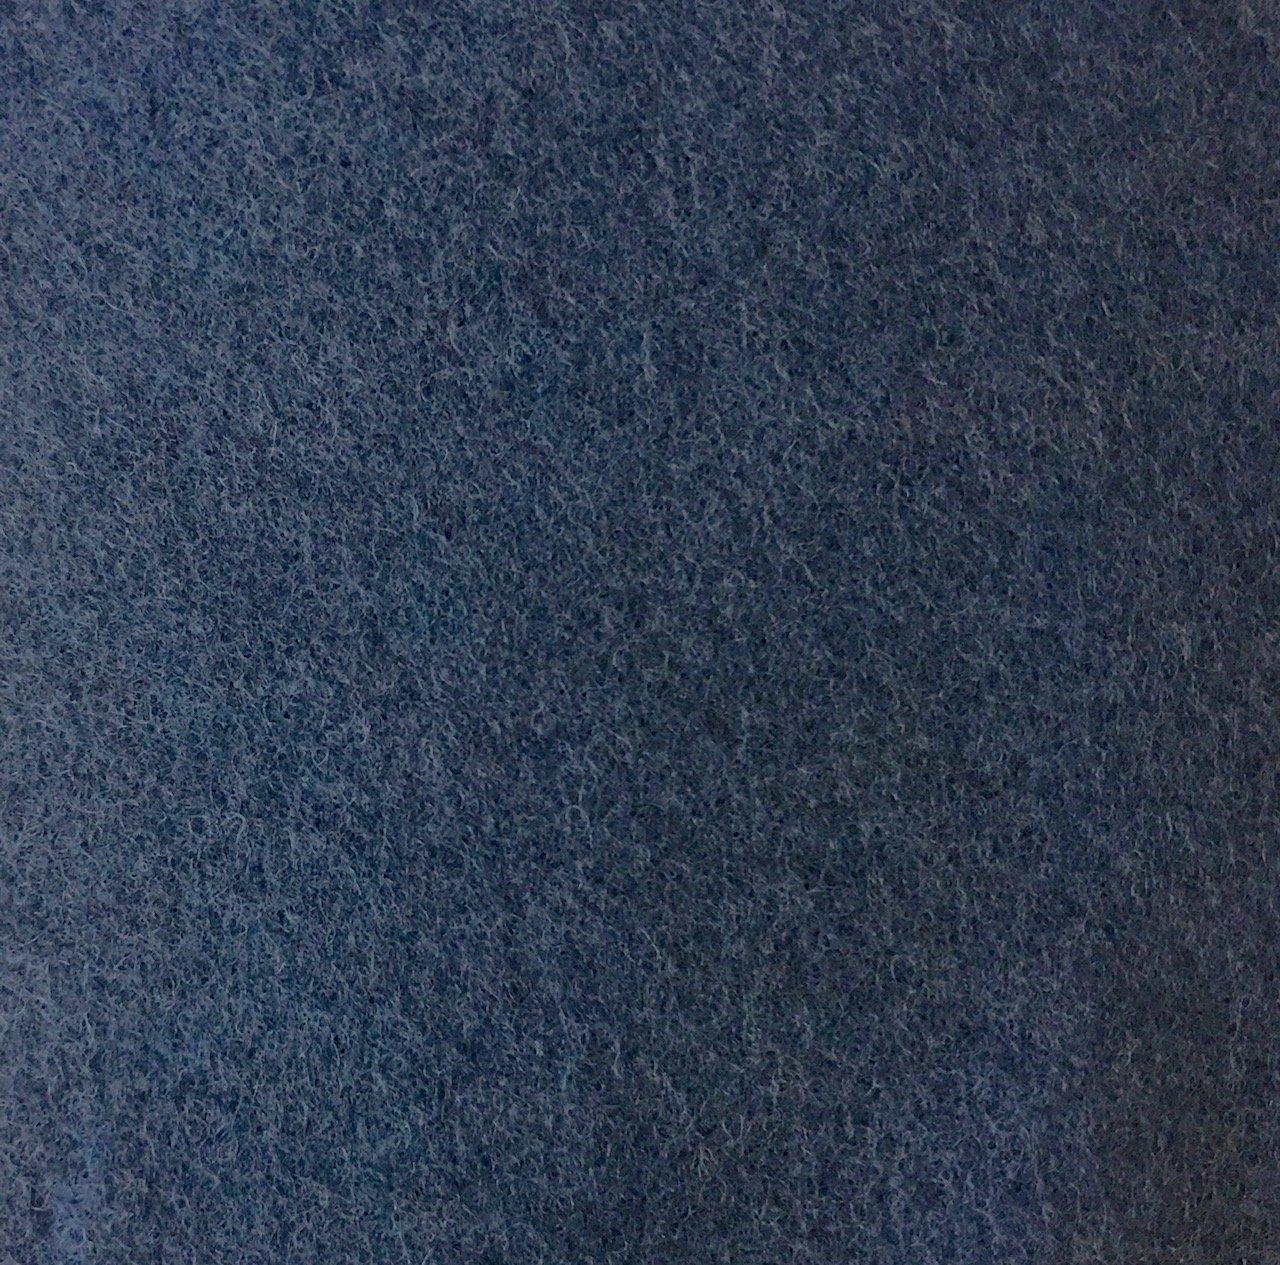 Wool Blend -  Blue Slate